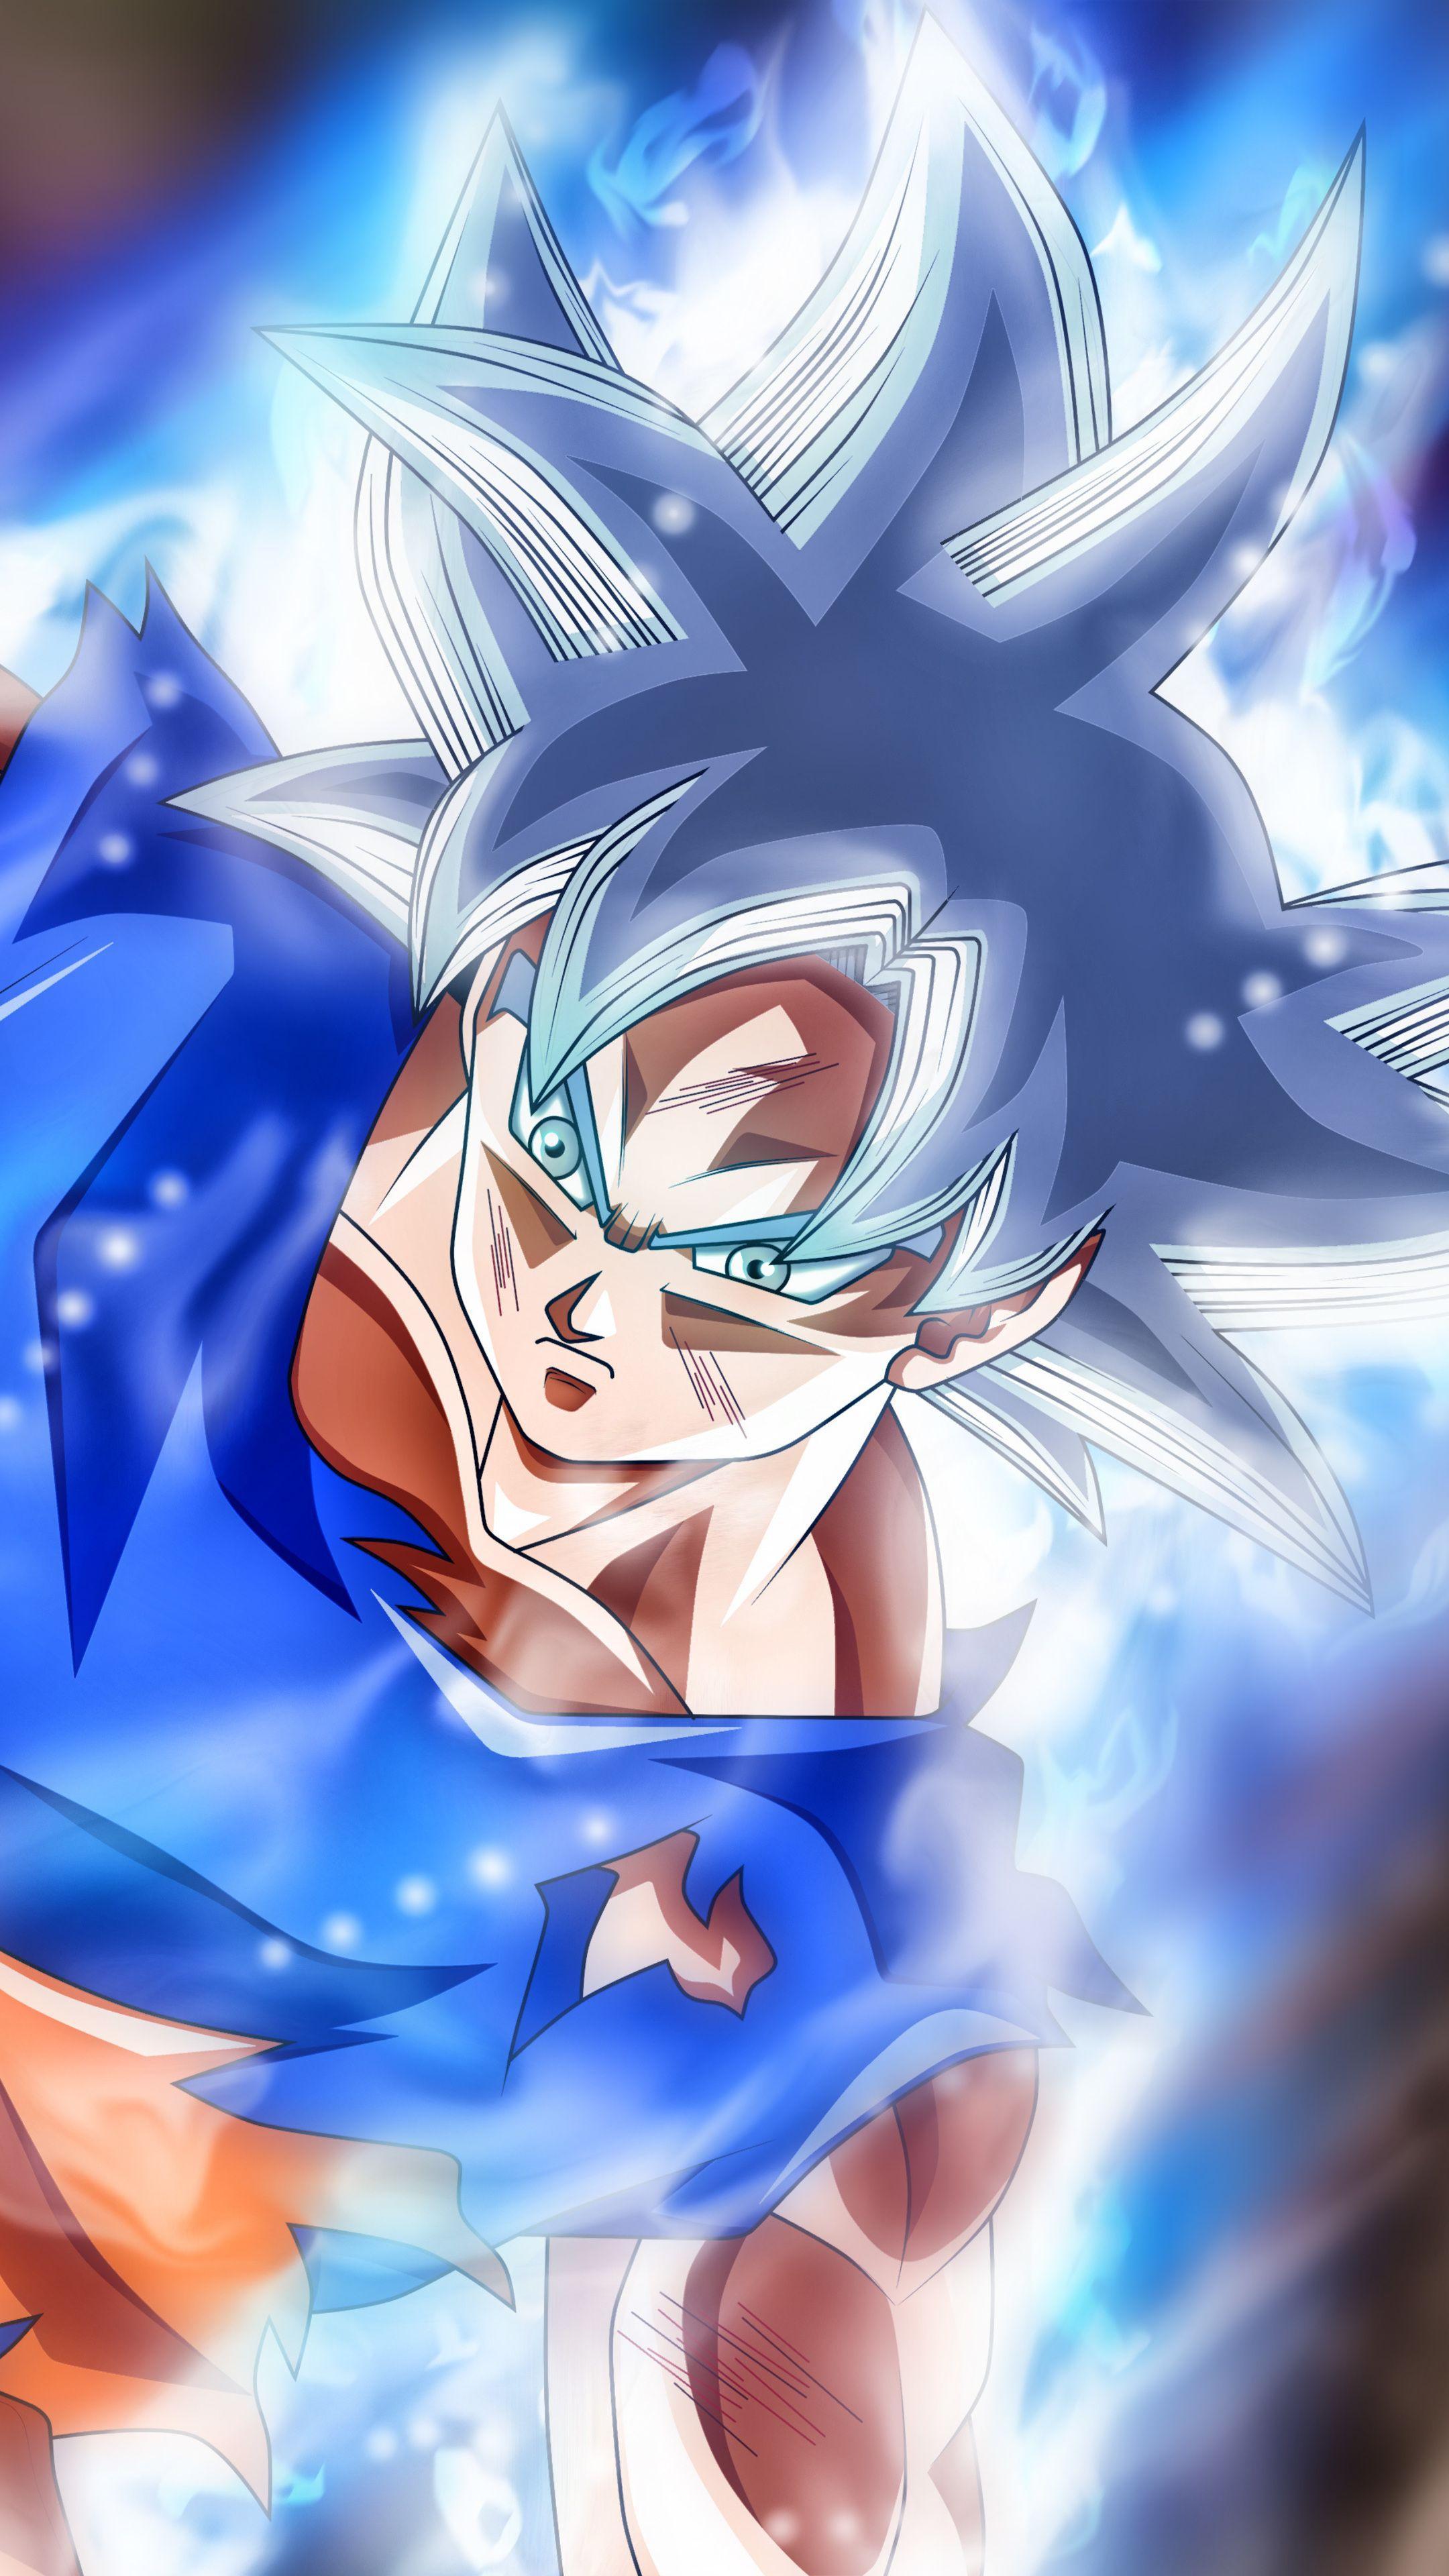 Mastered Ultra Instinct Goku Wallpapers - Wallpaper Cave